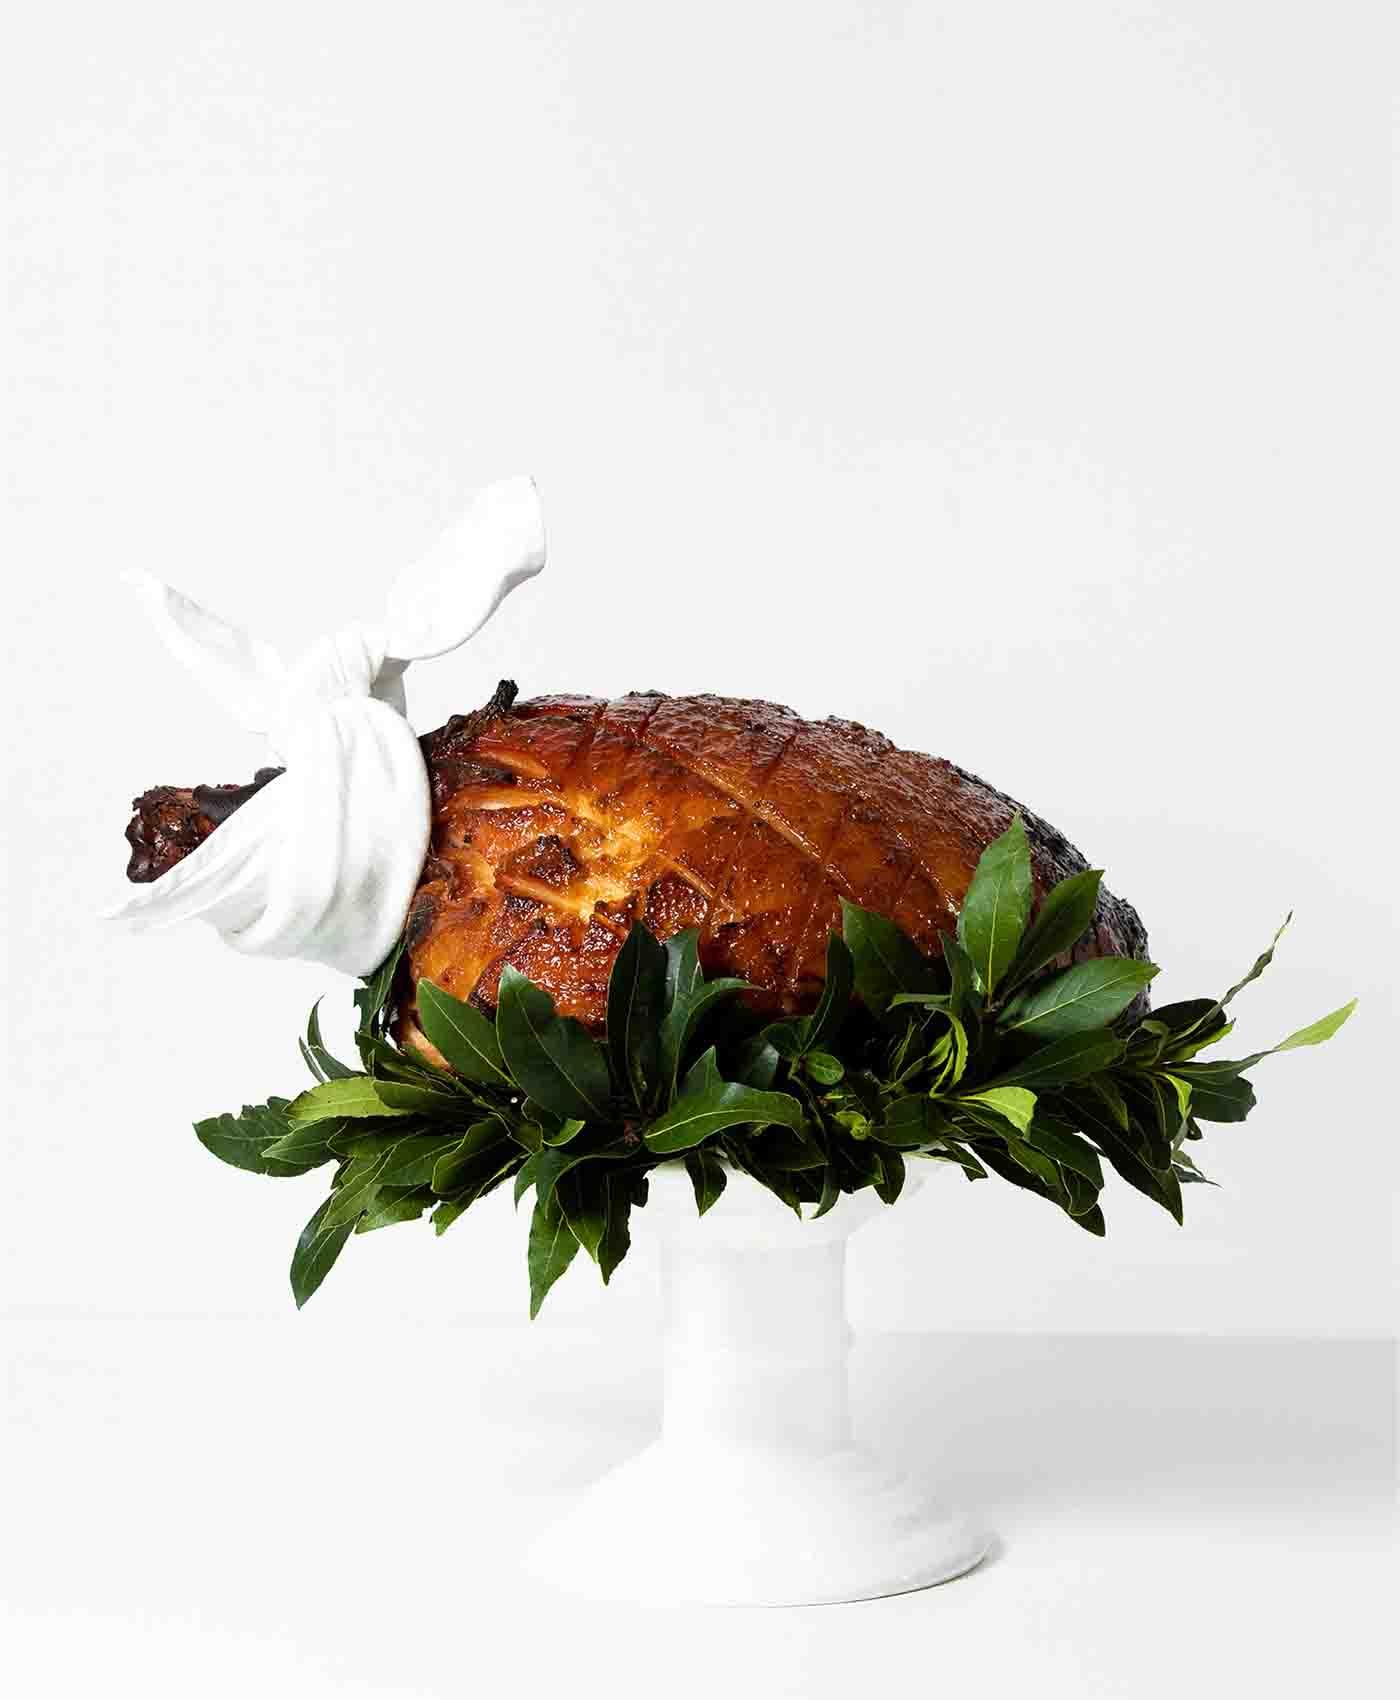 Peter Rowland Christmas Ham On Stand